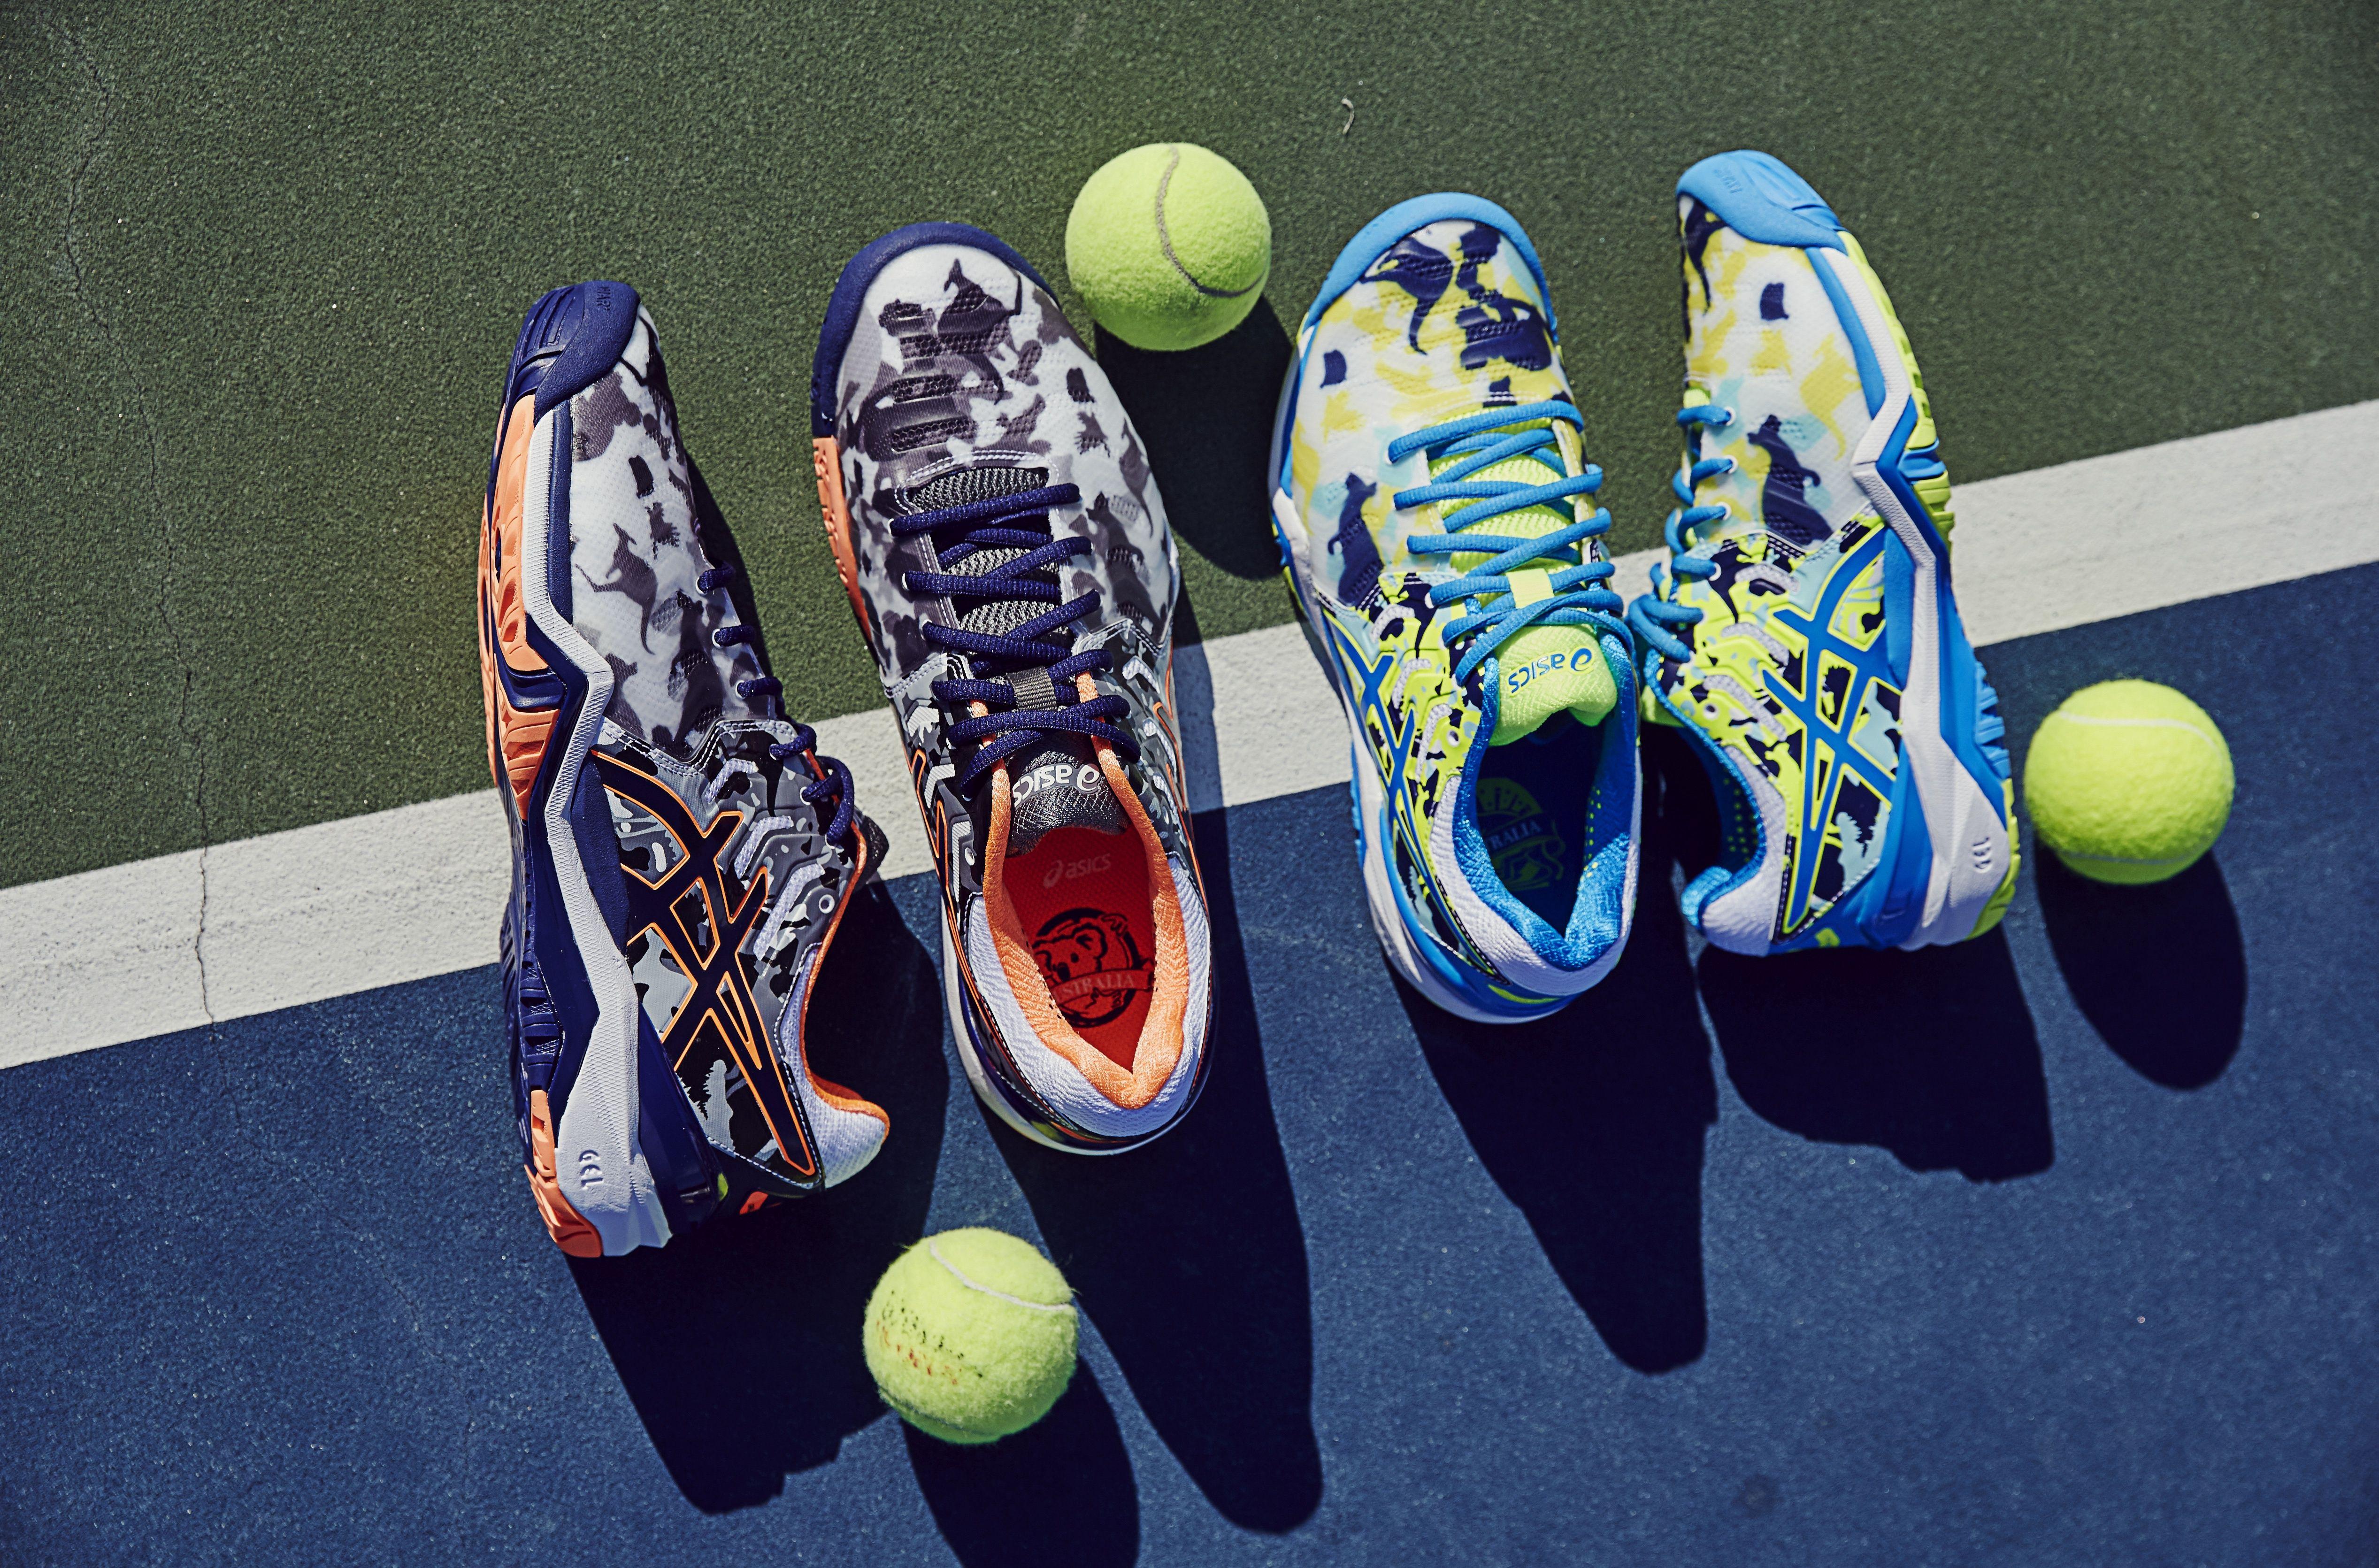 asics clay tennis